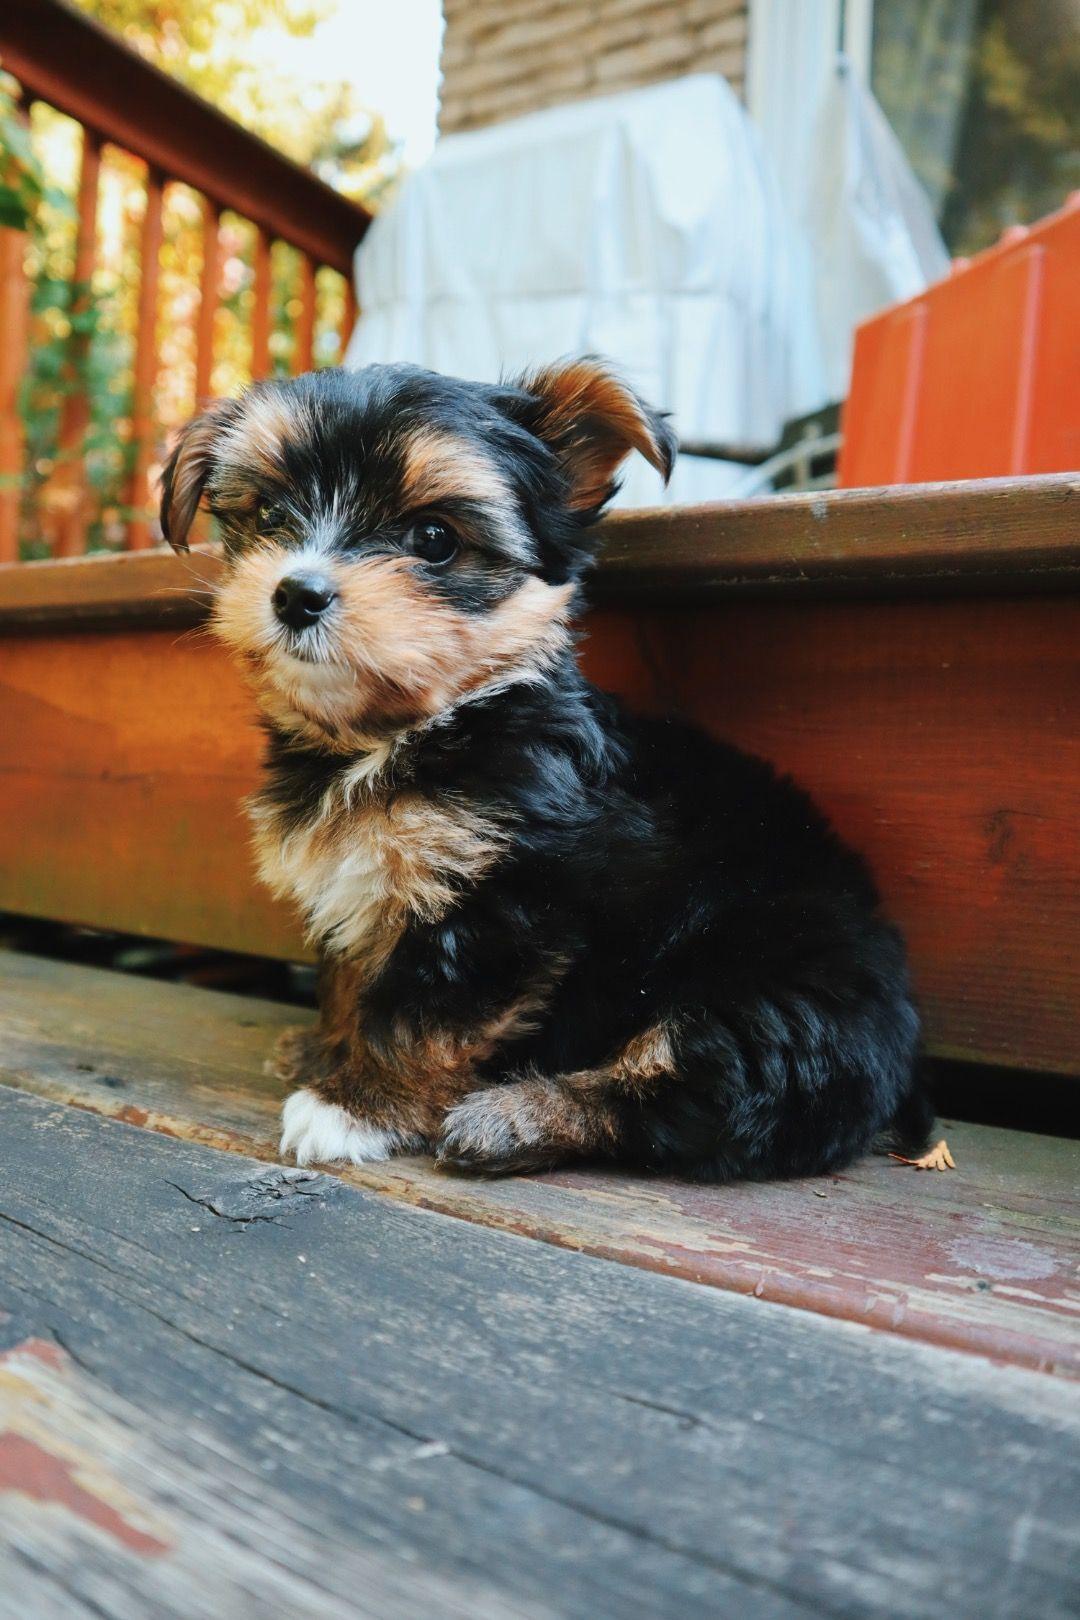 I got a puppy bringing him home first few days